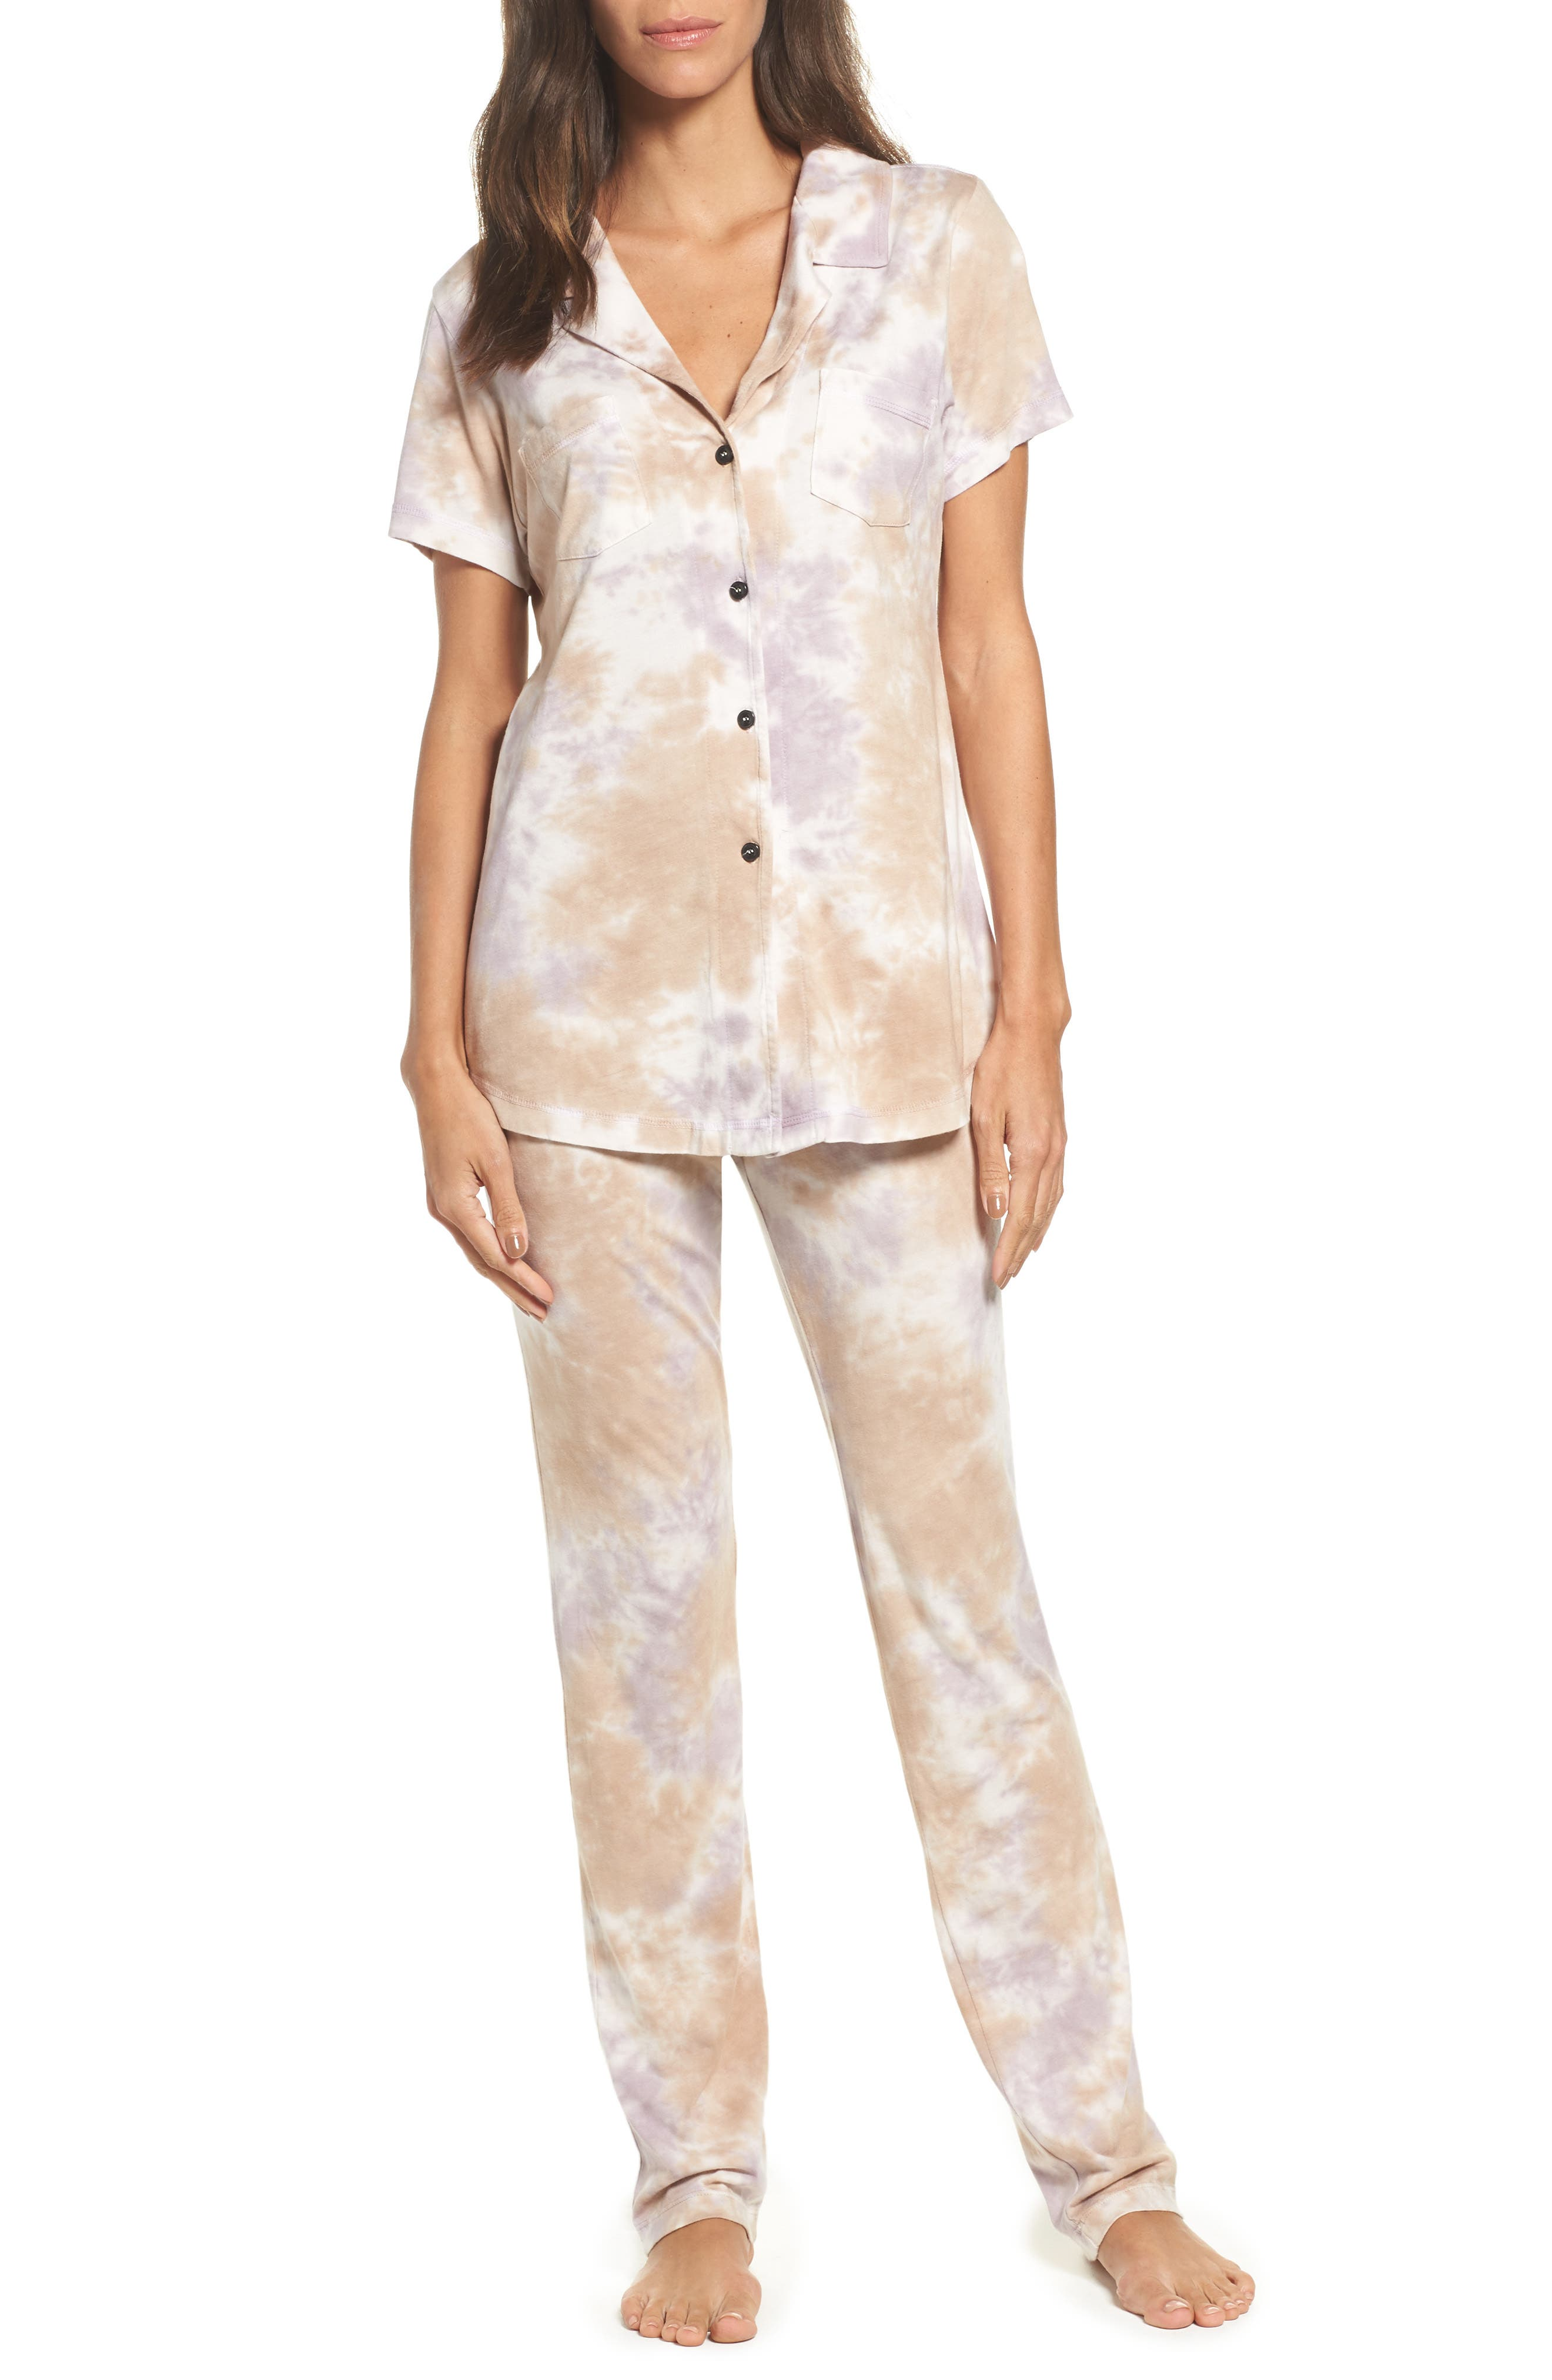 Christine Slim Leg Pajamas,                             Main thumbnail 1, color,                             Ash Violet